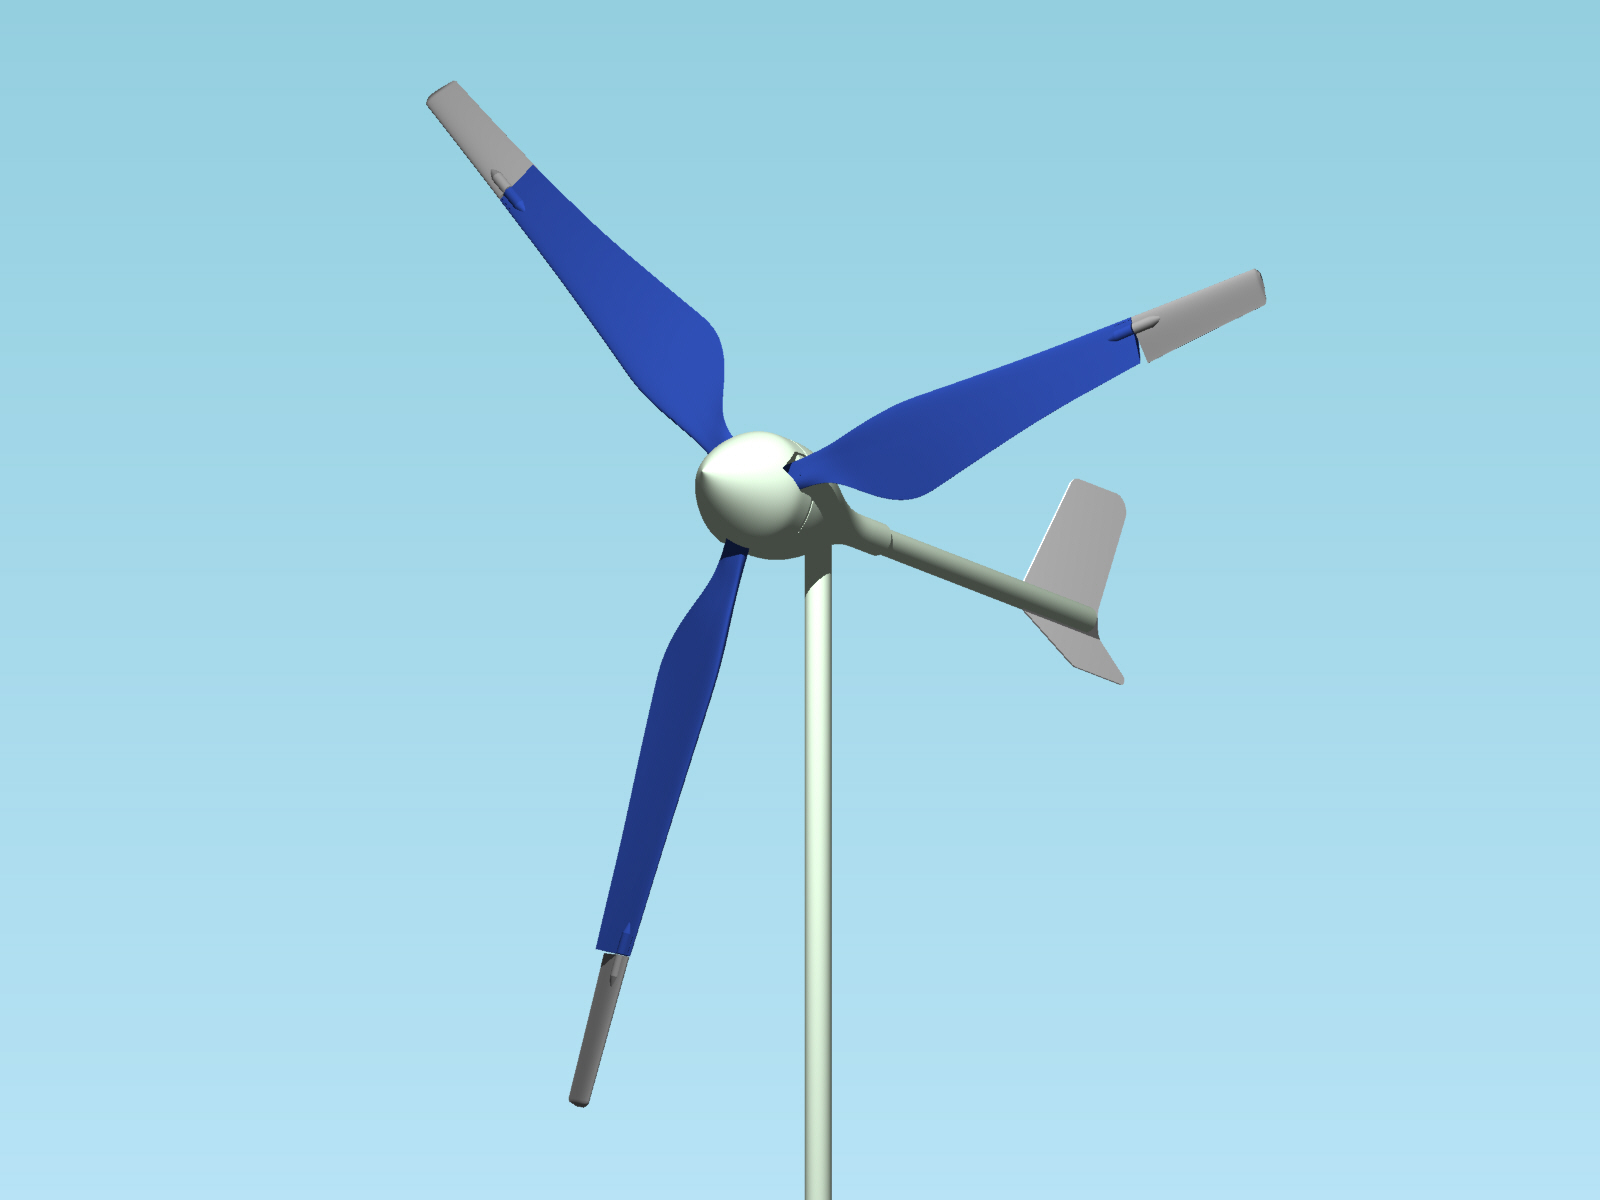 Nelson Mandela University – Innovolve Segmented turbine